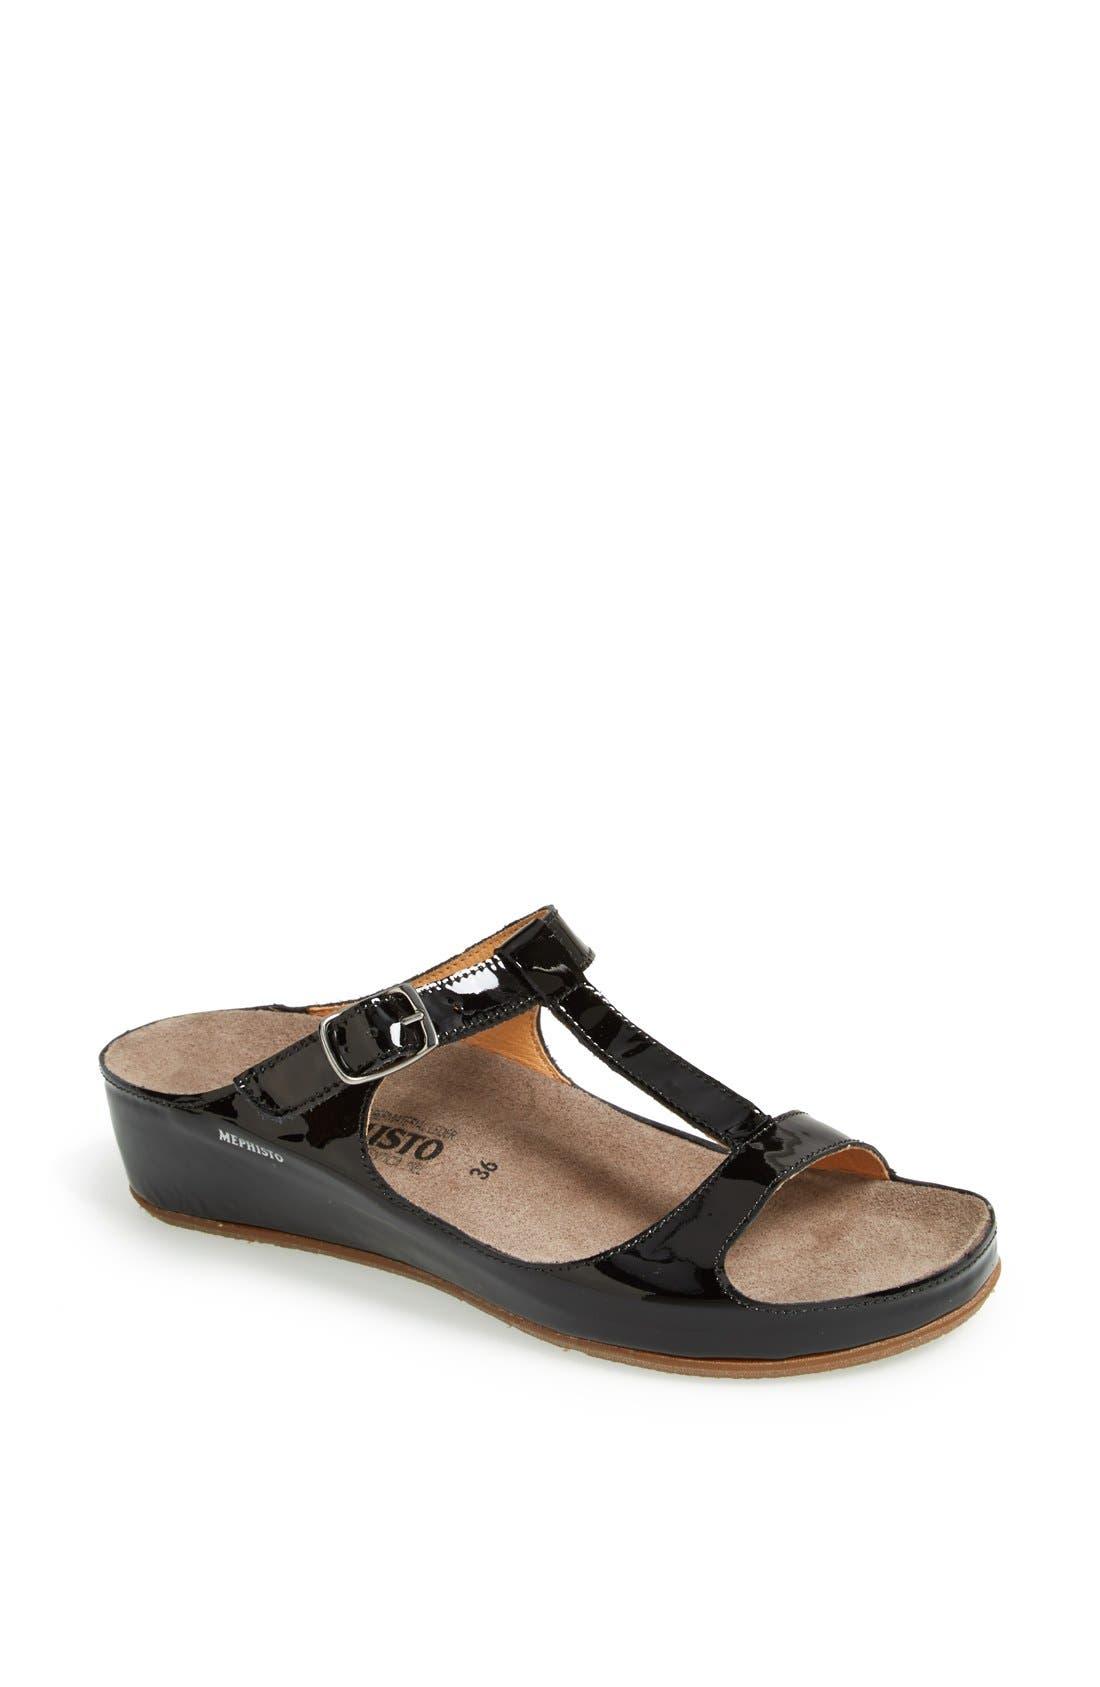 Alternate Image 1 Selected - Mephisto 'Valena' Sandal